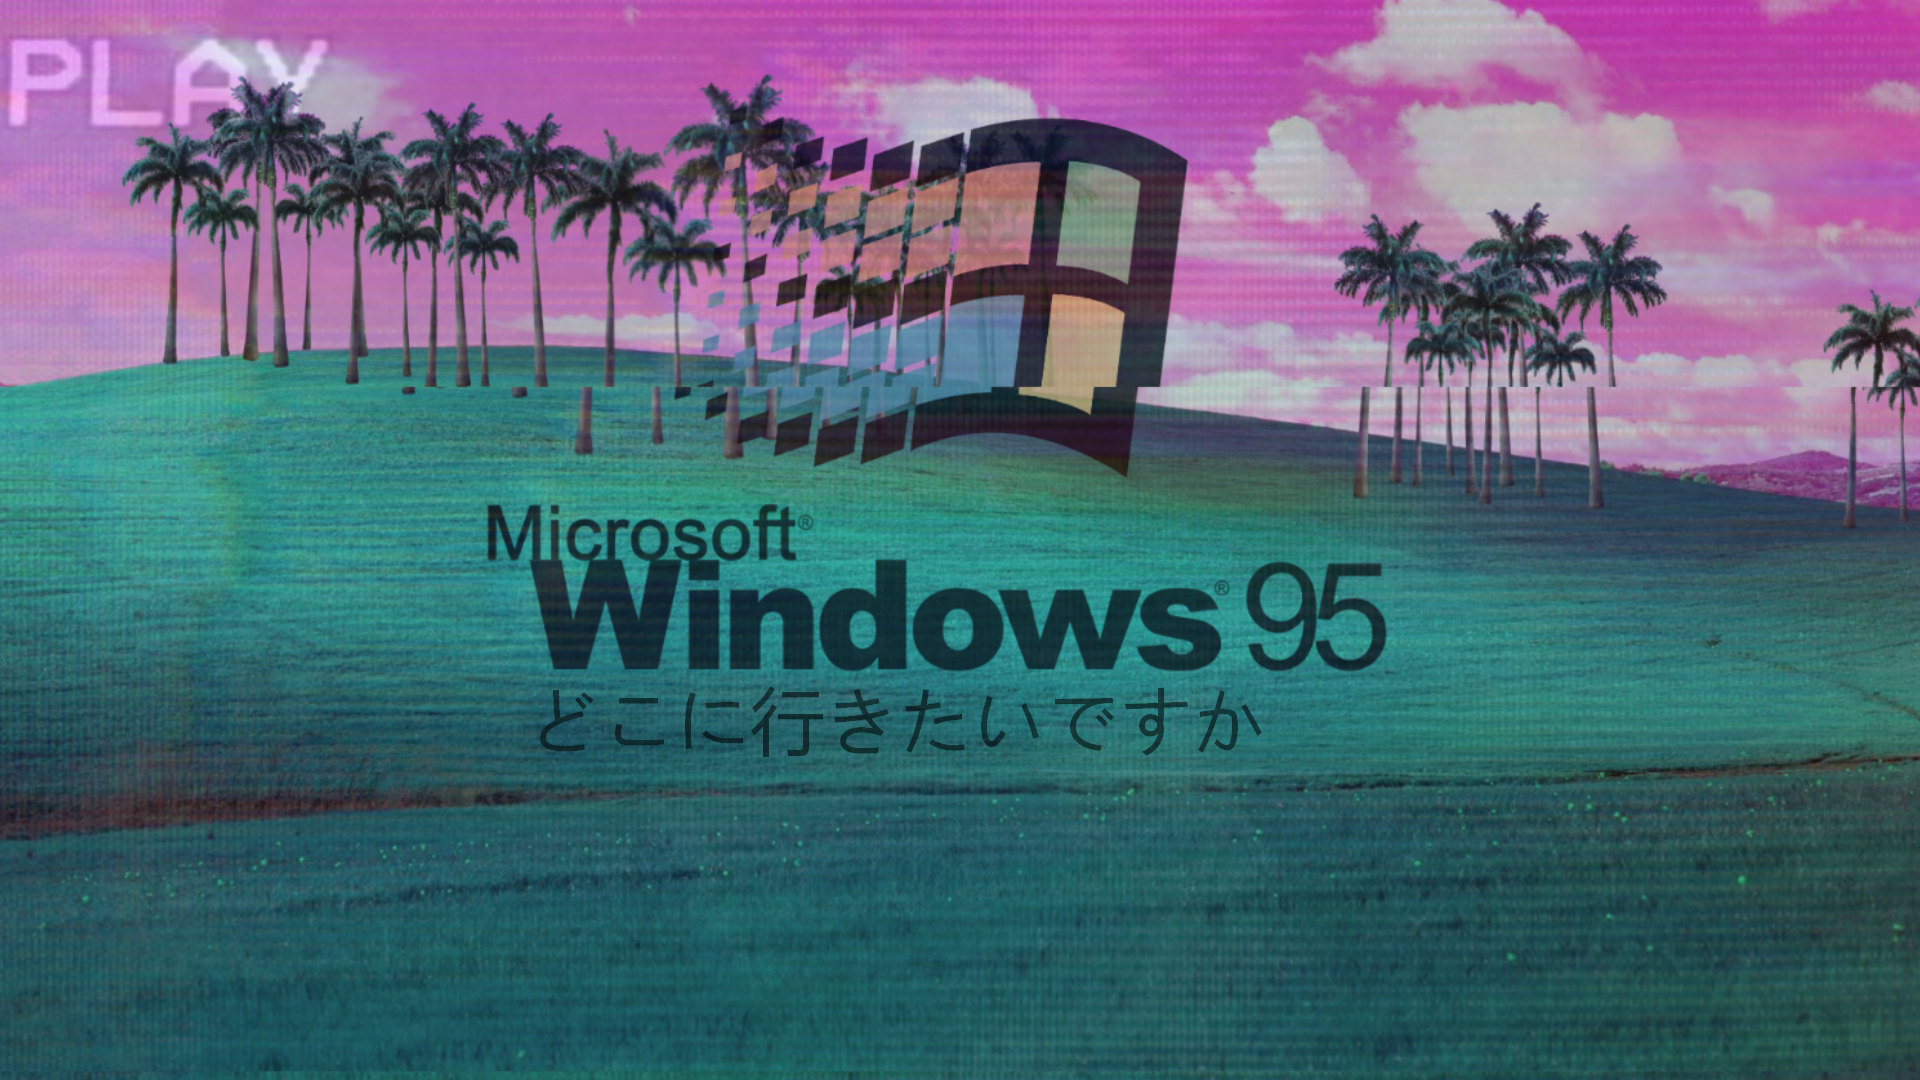 Aesthetic Windows 95 [1920x1080] wallpapers 1920x1080